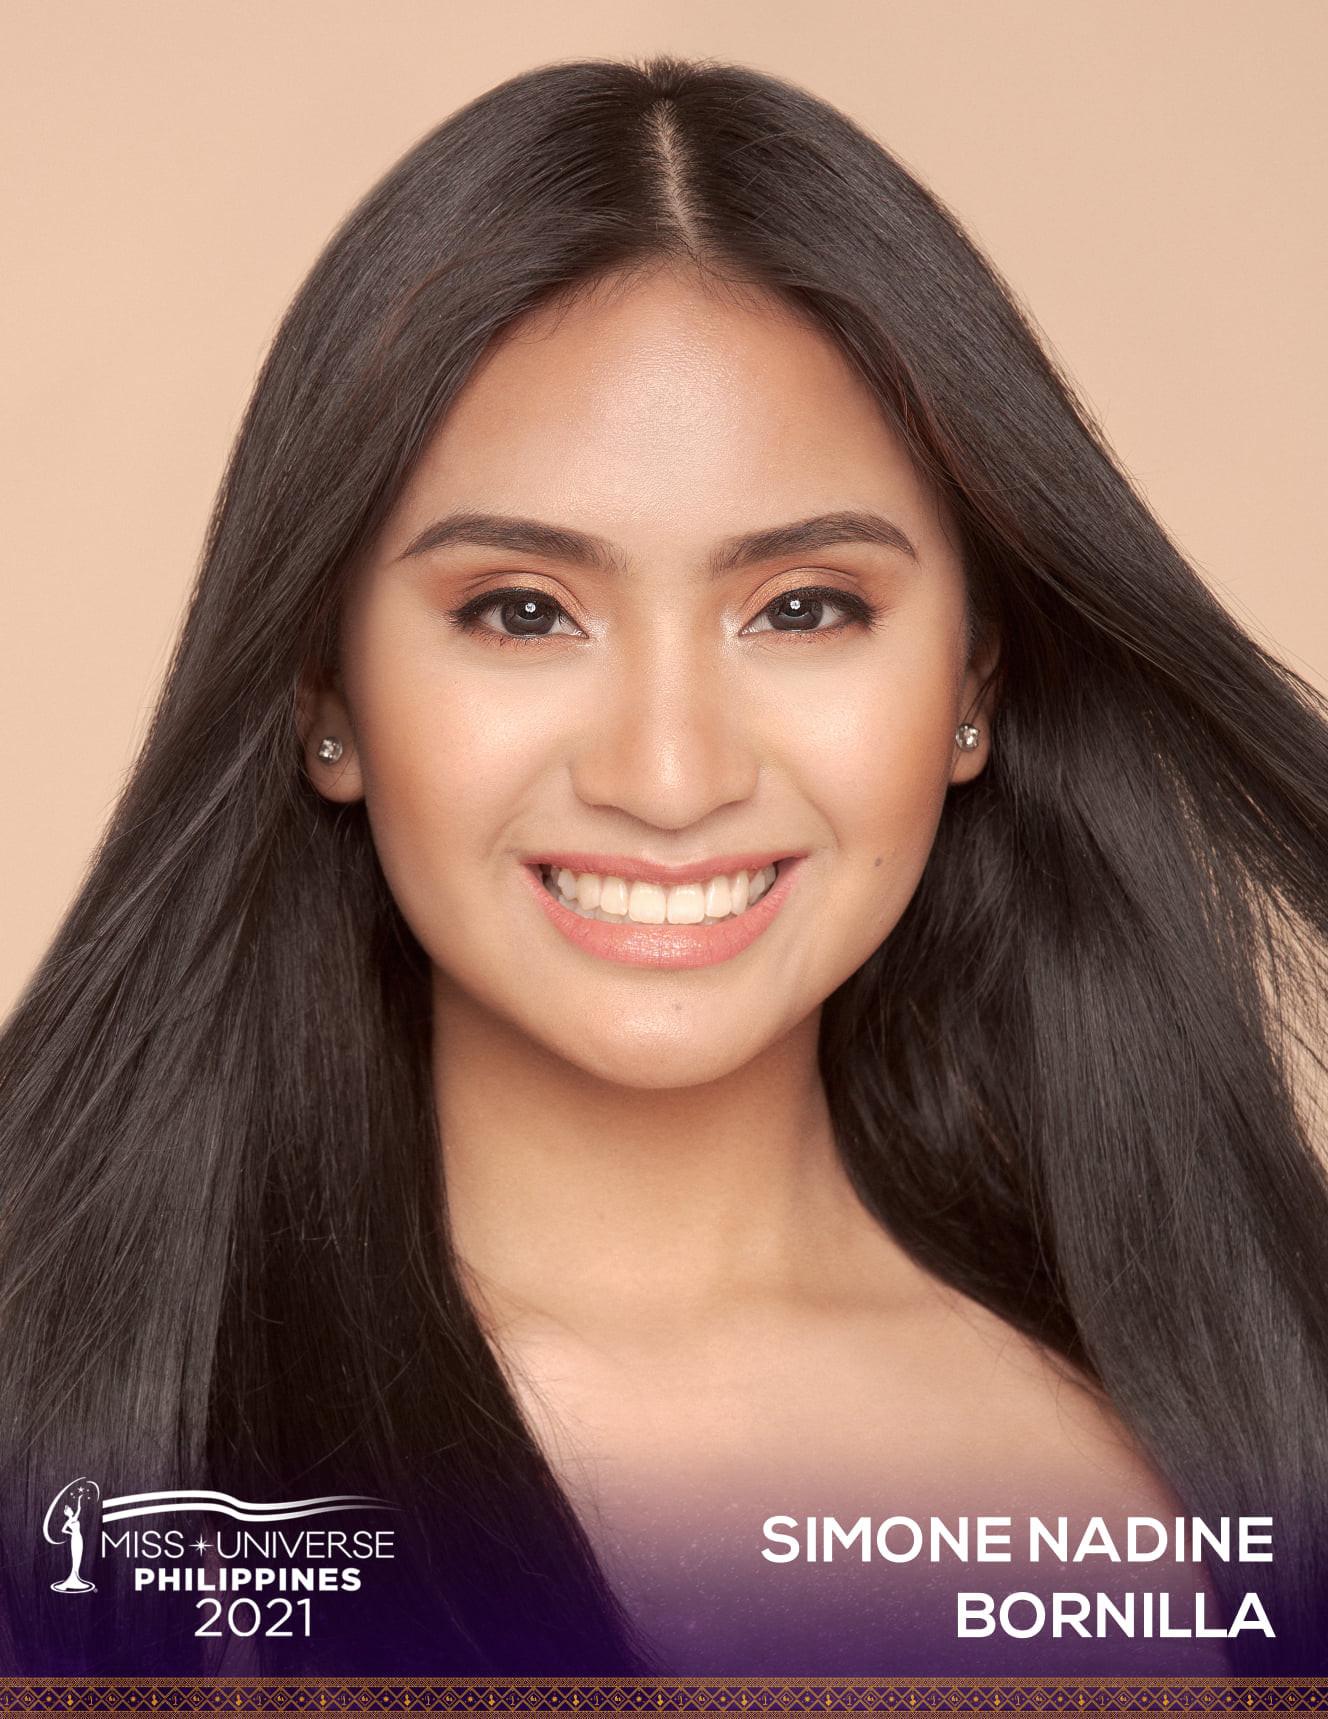 pre-candidatas a miss universe philippines 2021. - Página 3 AlqTue